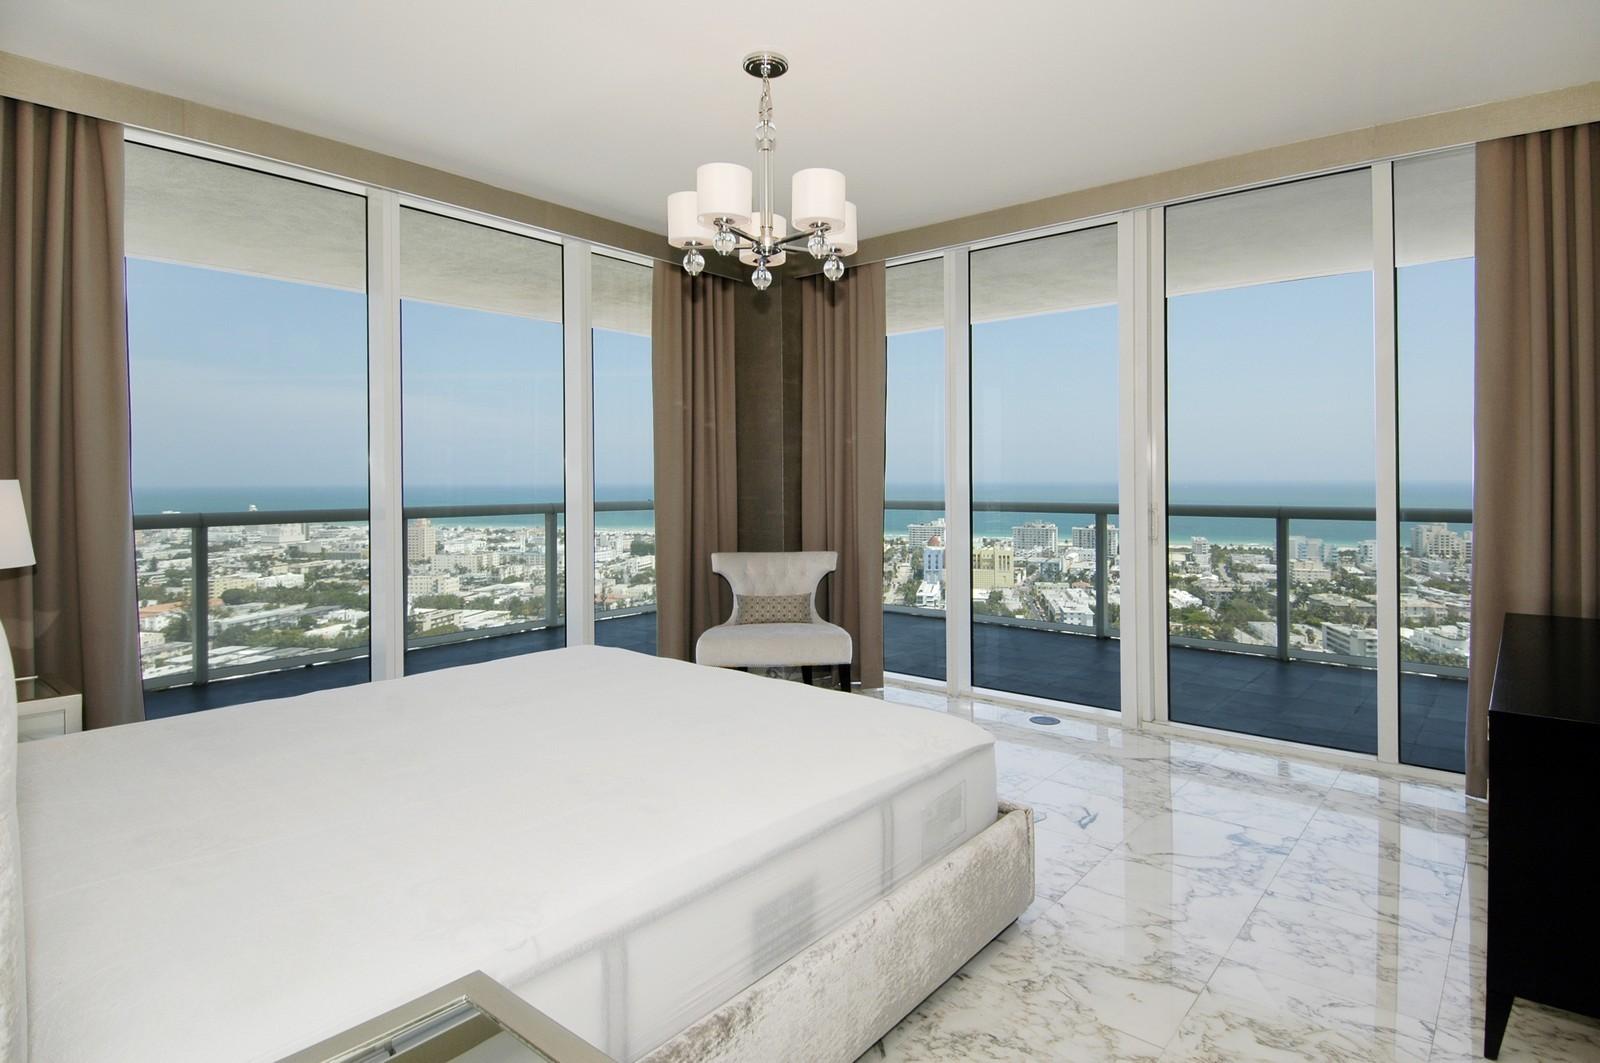 Real Estate Photography - 450 Alton Rd, Unit 2910, Miami Beach, FL, 33139 - Master Bedroom